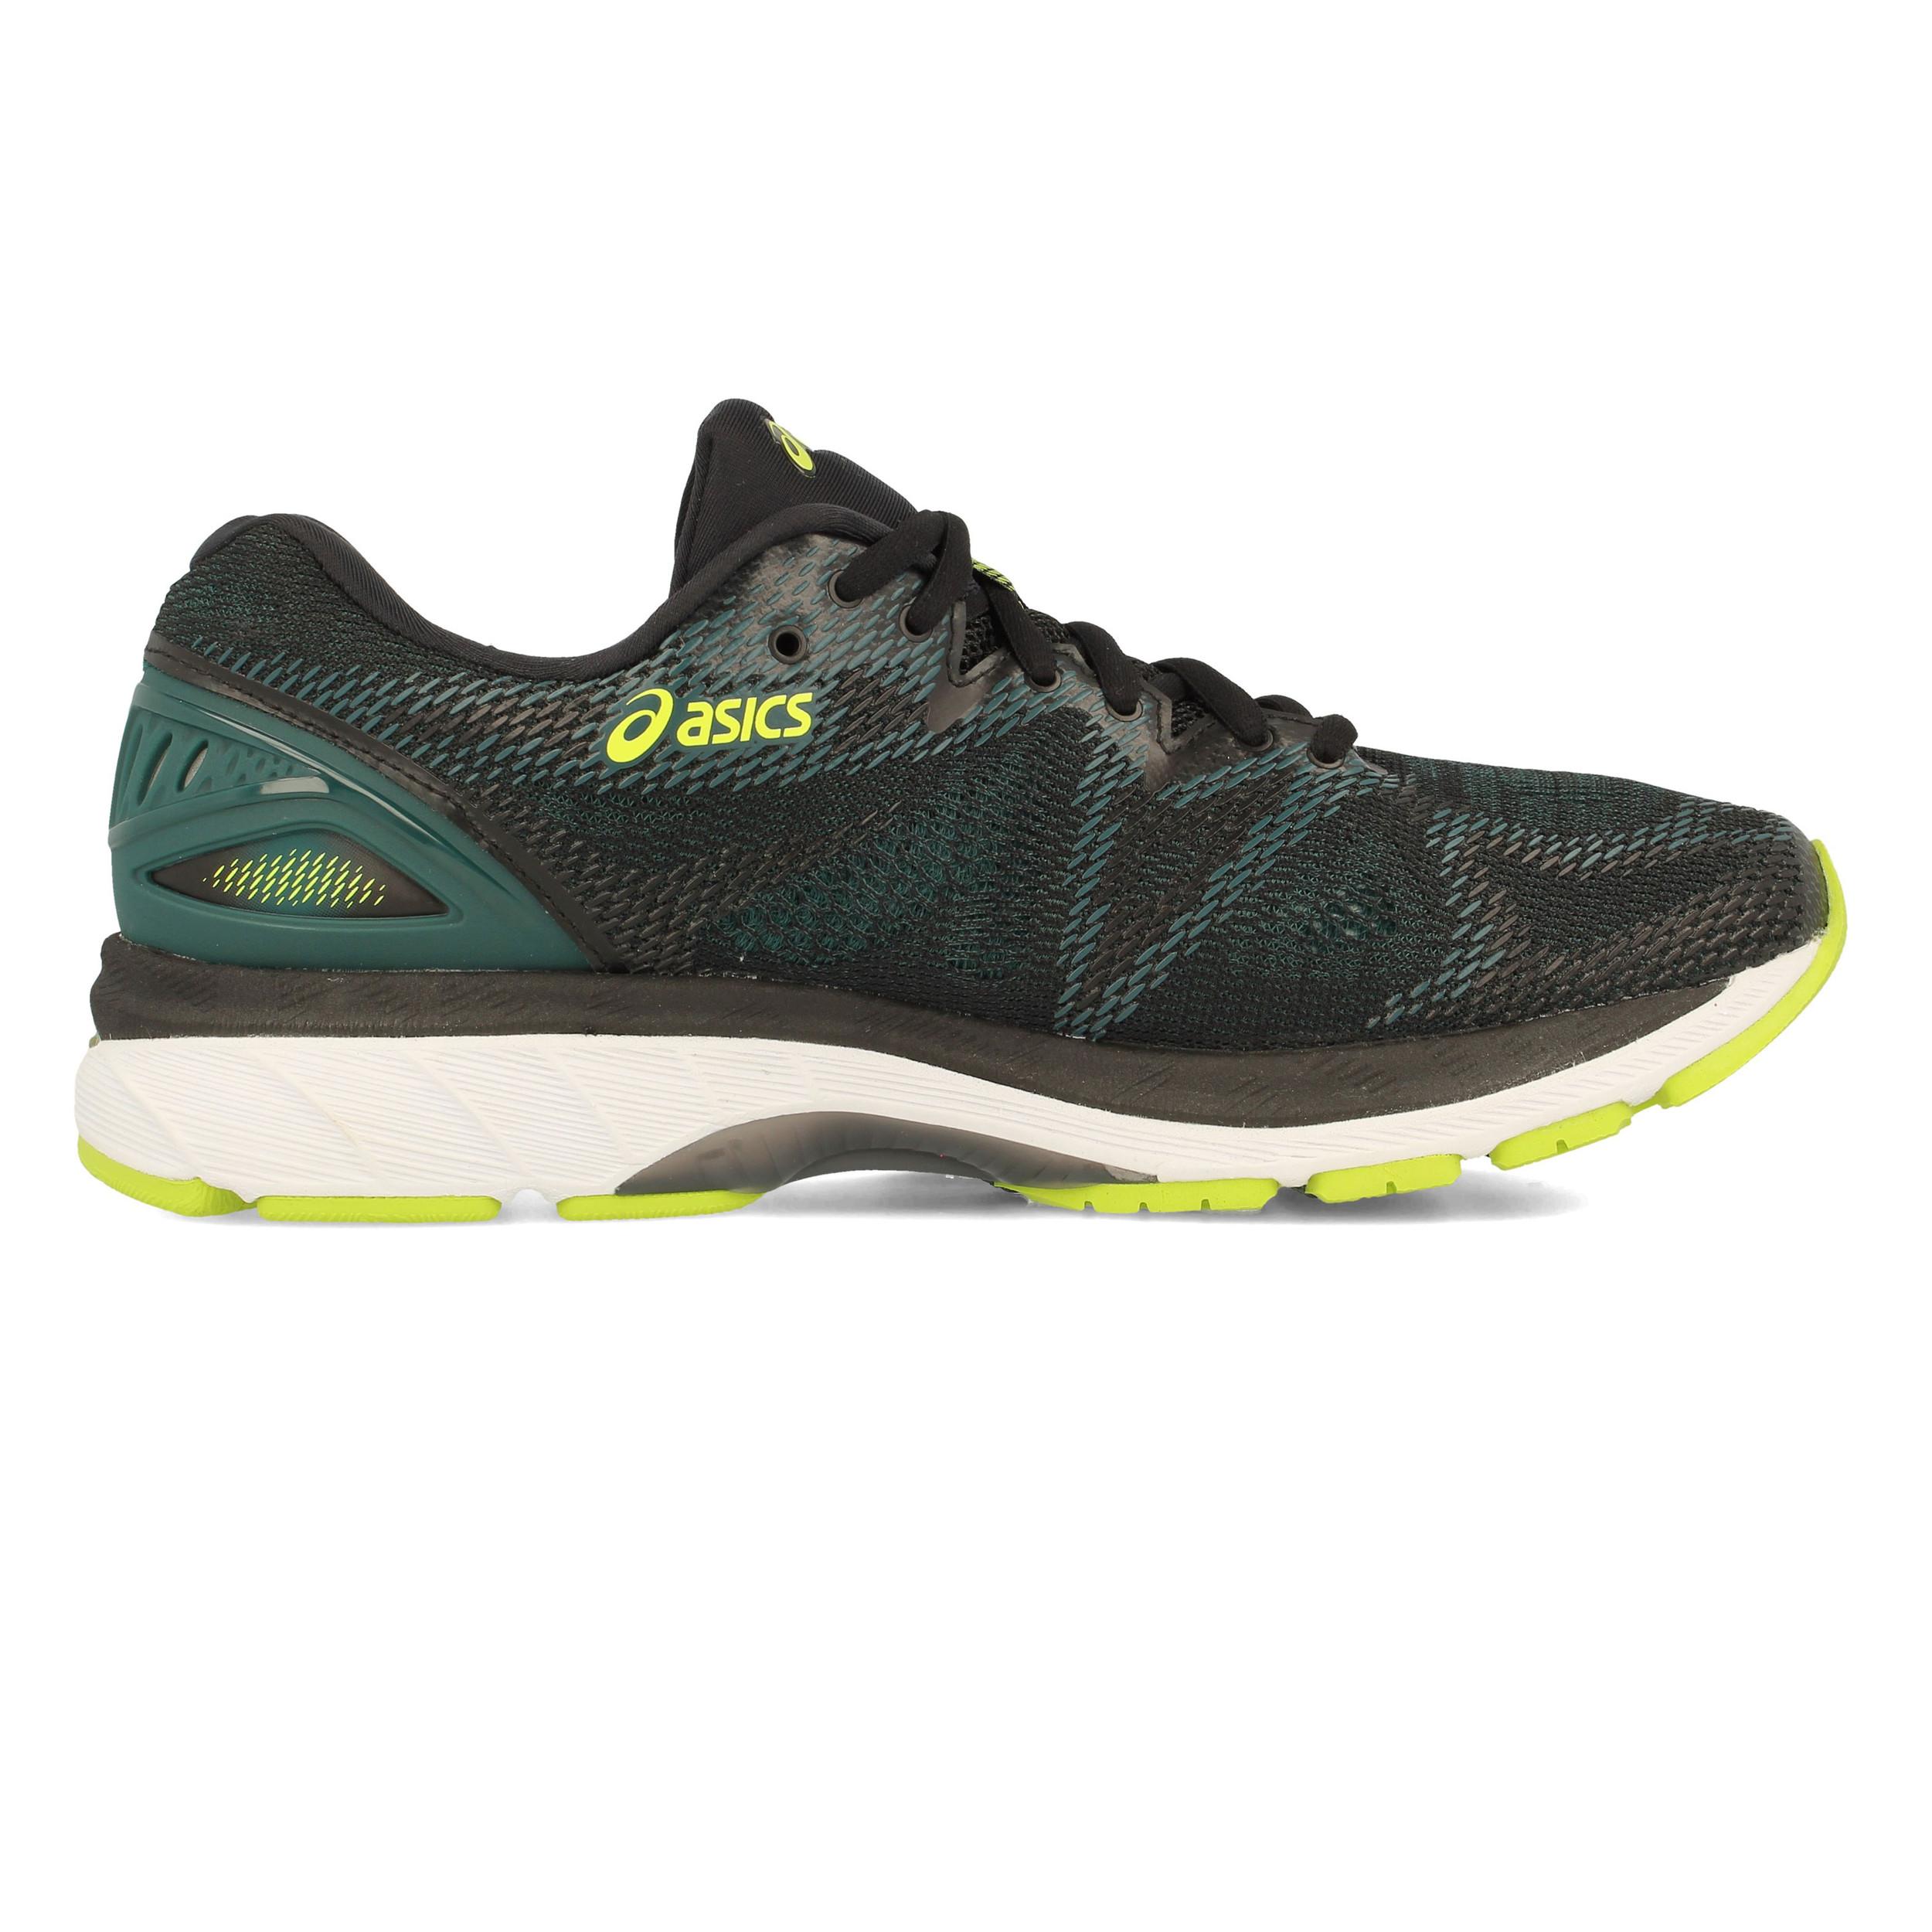 Asics Asics Asics Hombre Gel-nimbus 20 Correr Zapatos Zapatillas Verde Deporte Transpirable 41bee3